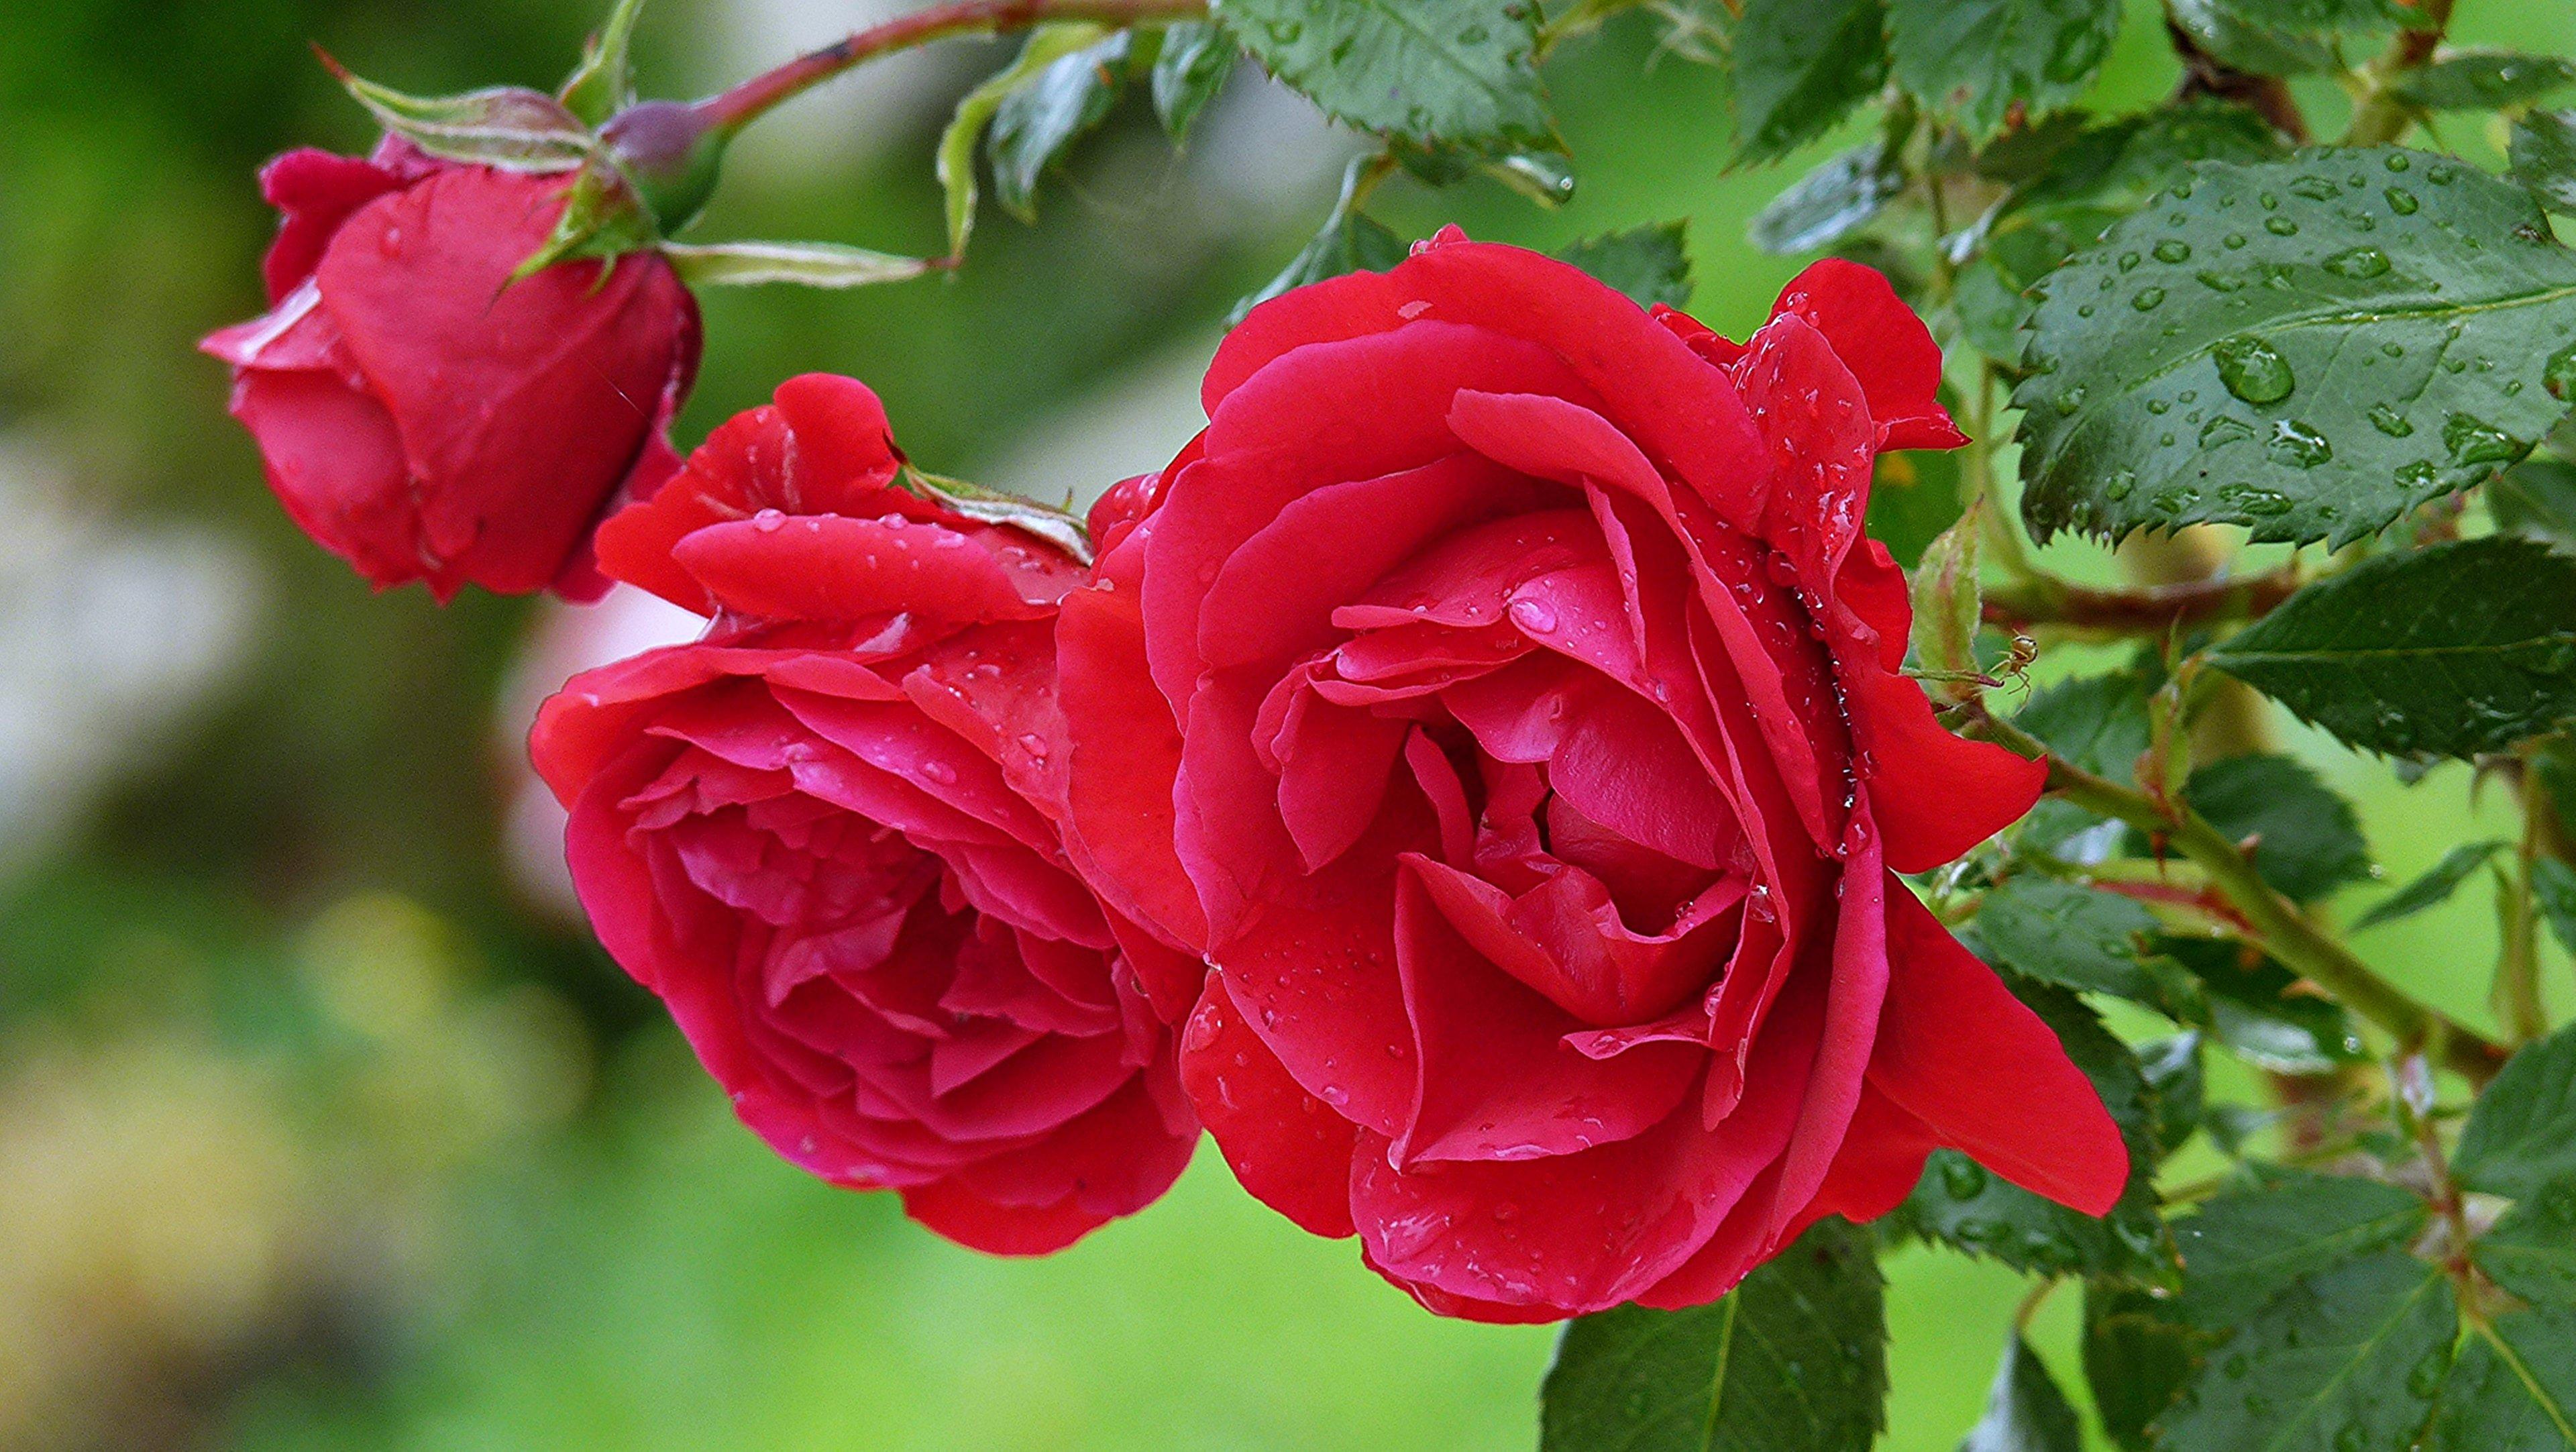 Red Flower Spring Nature Red Rose Flower Rose Wallpaper 3840x2164